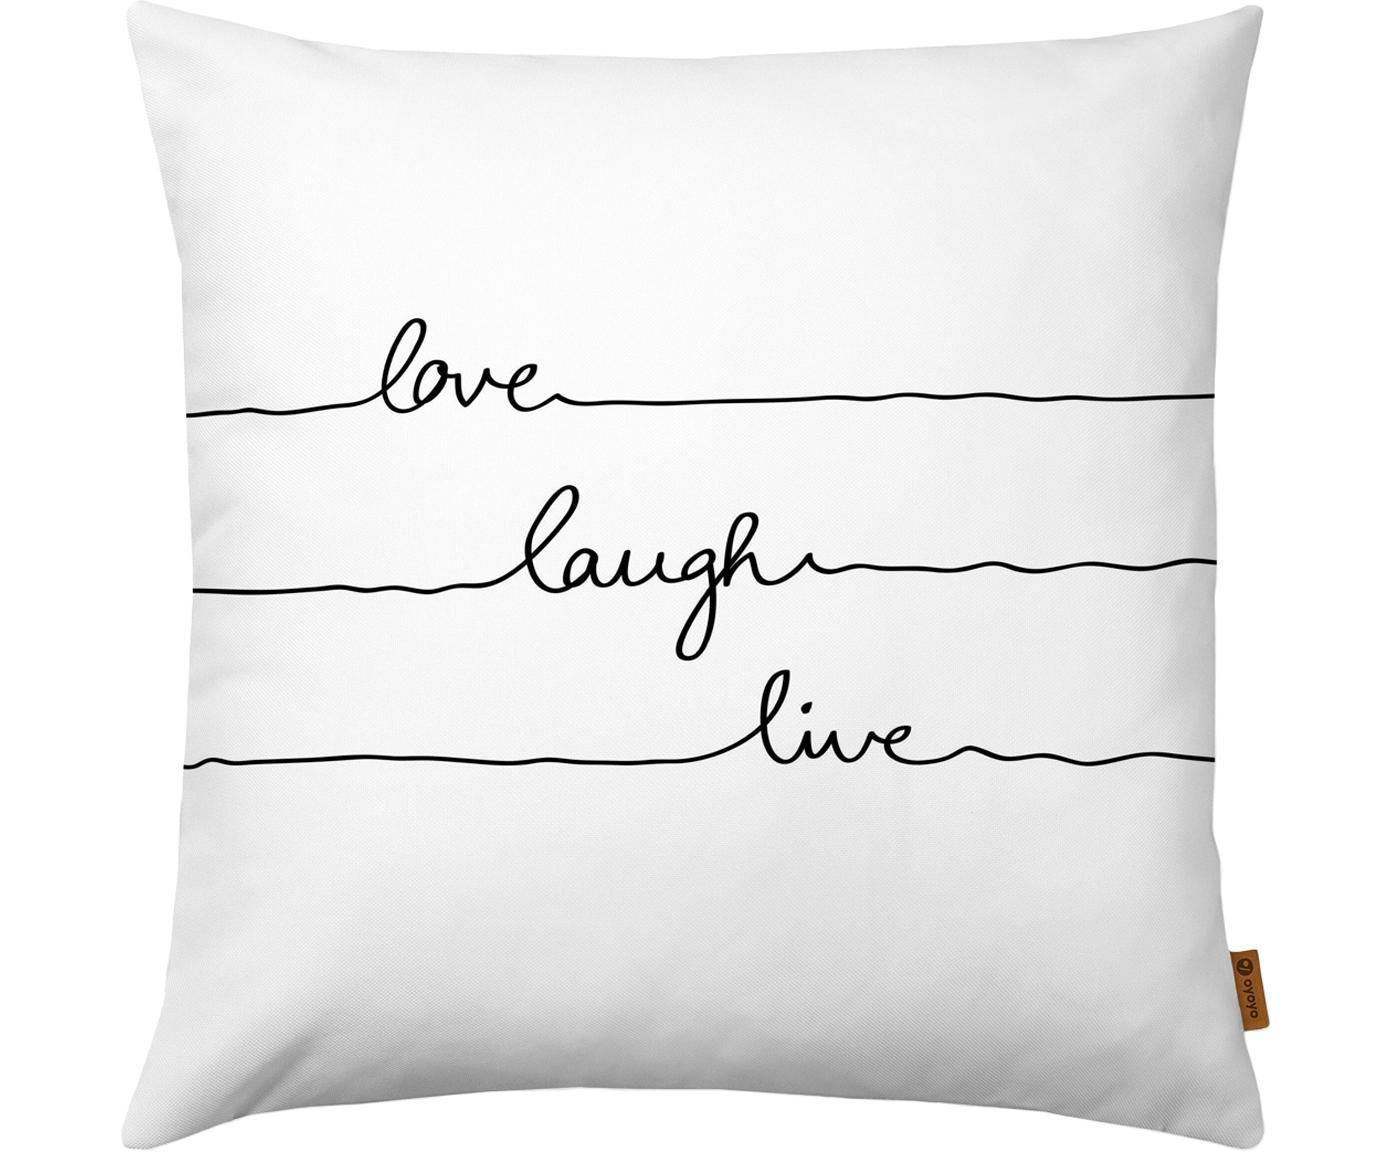 Kussenhoes Love Laugh Live met opschrift, Polyester, Wit, zwart, 40 x 40 cm